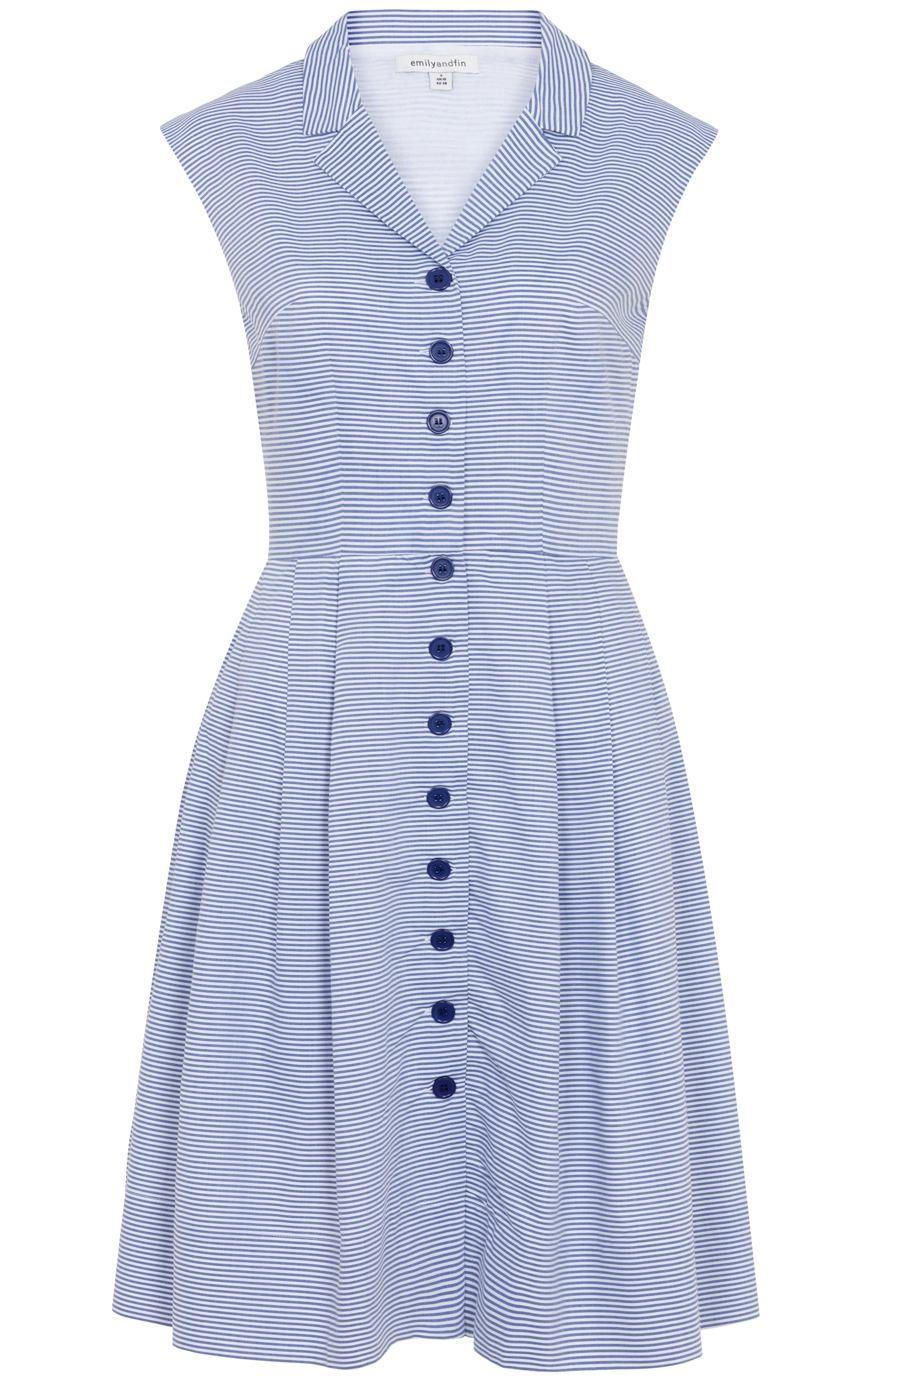 58ca241a9f8d Μιντι ριγε σιελ σεμιζιέ φορεμα απο βαμβακερο λεπτο υφασμα με print και  τσεπες στα πλαινα